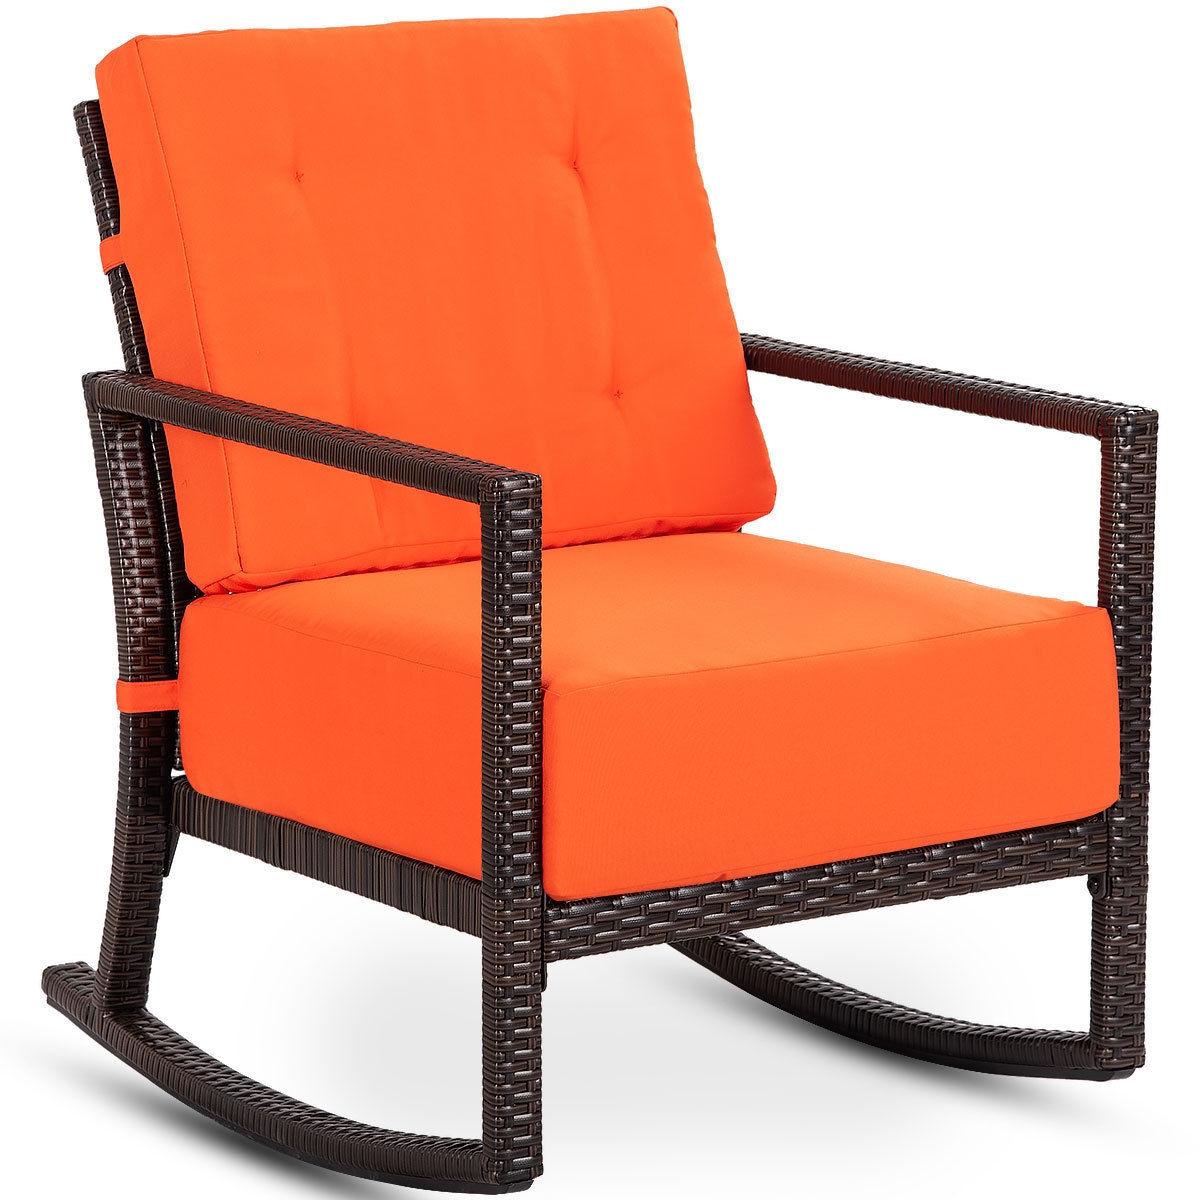 Patio Rattan Rocking Chair Rocker Armchair with Cushions